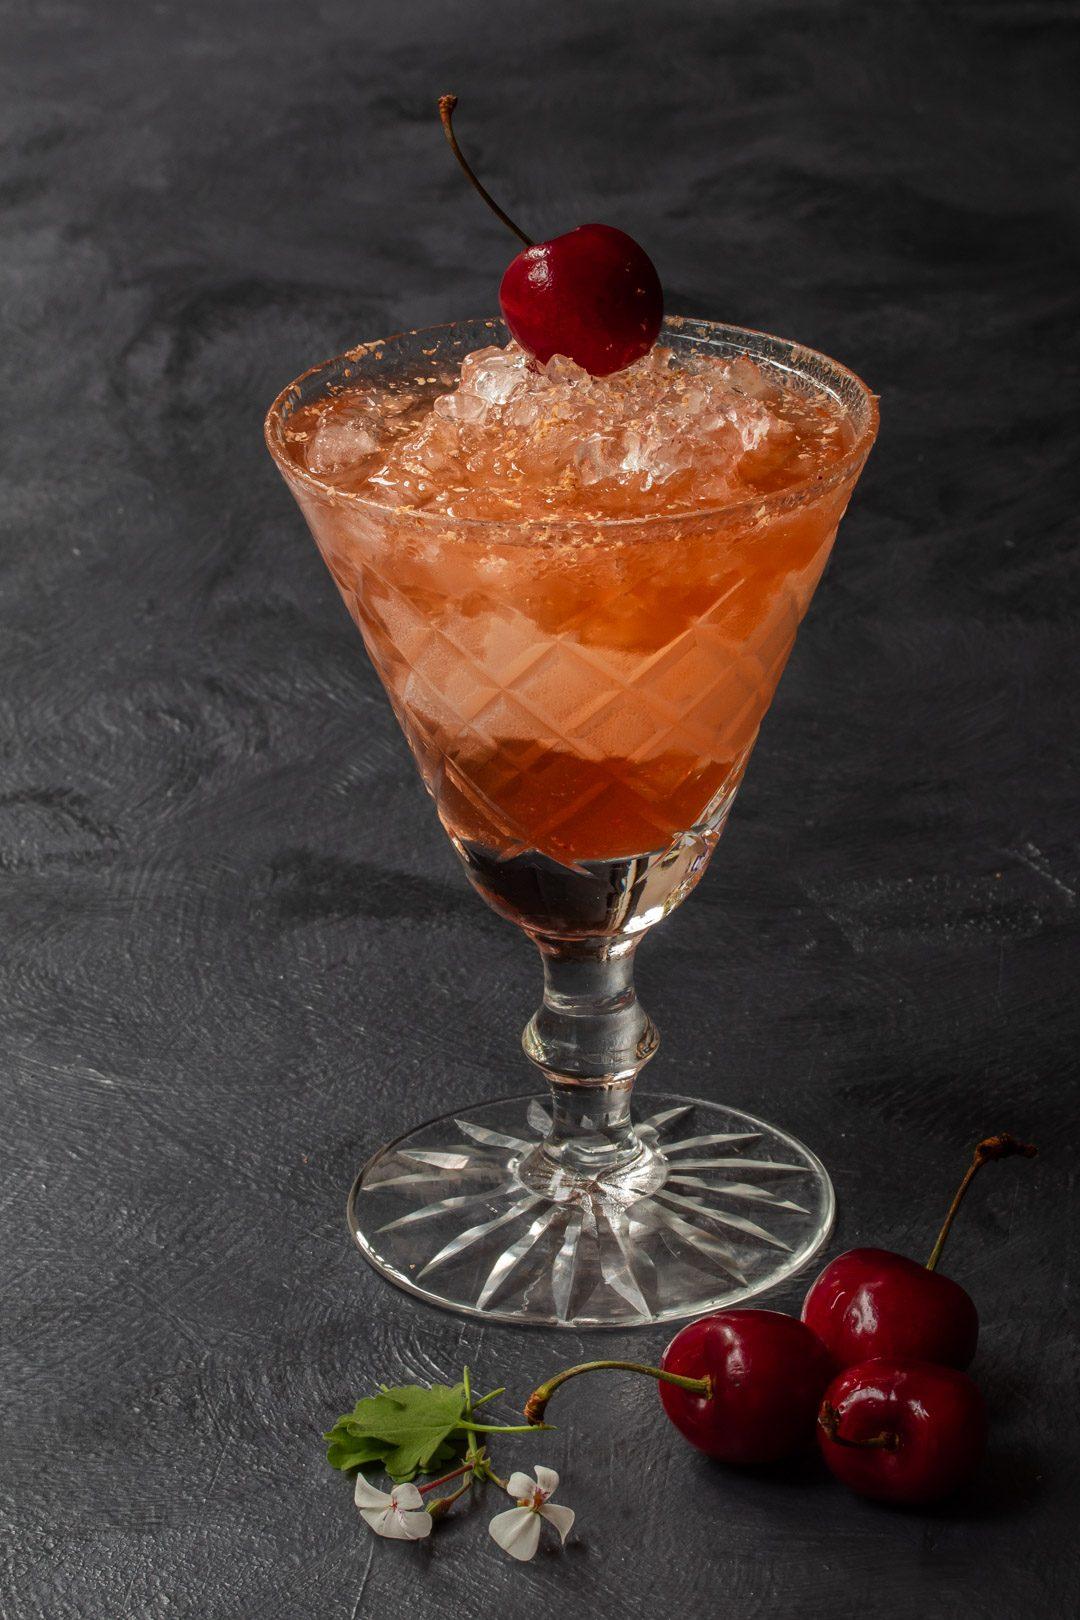 cherry shrub brandy daisy from 45 degrees